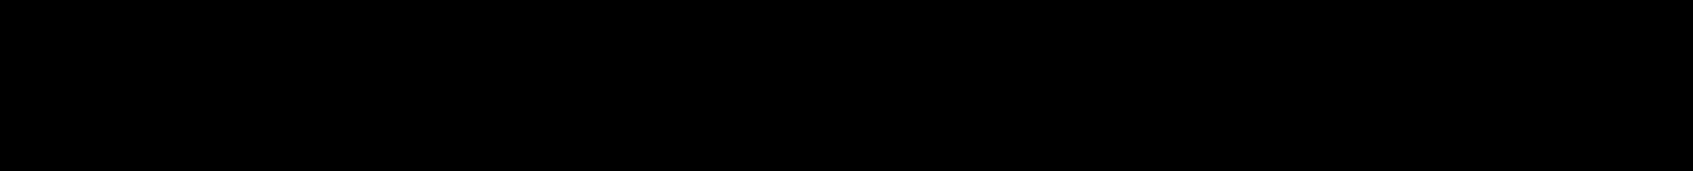 Sketch Fonts Fontspace